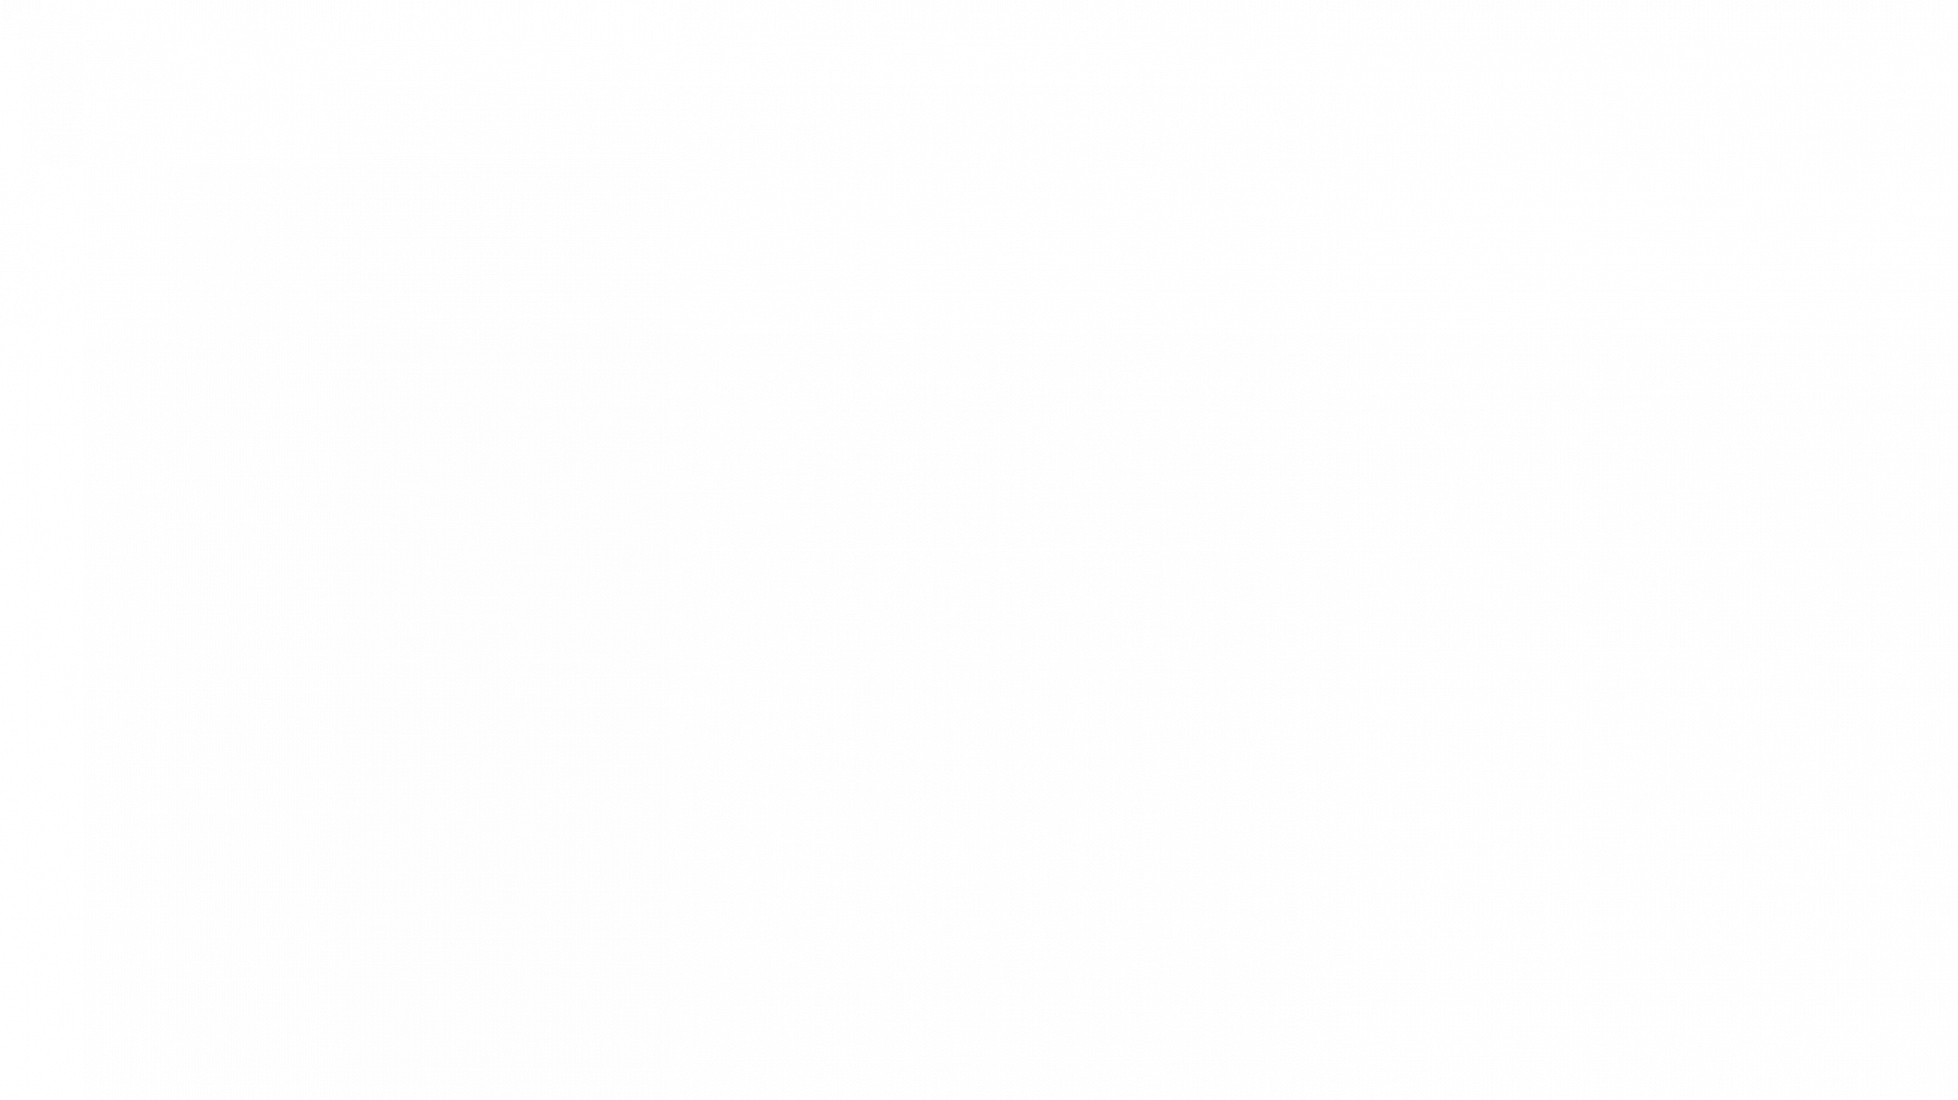 P1000069